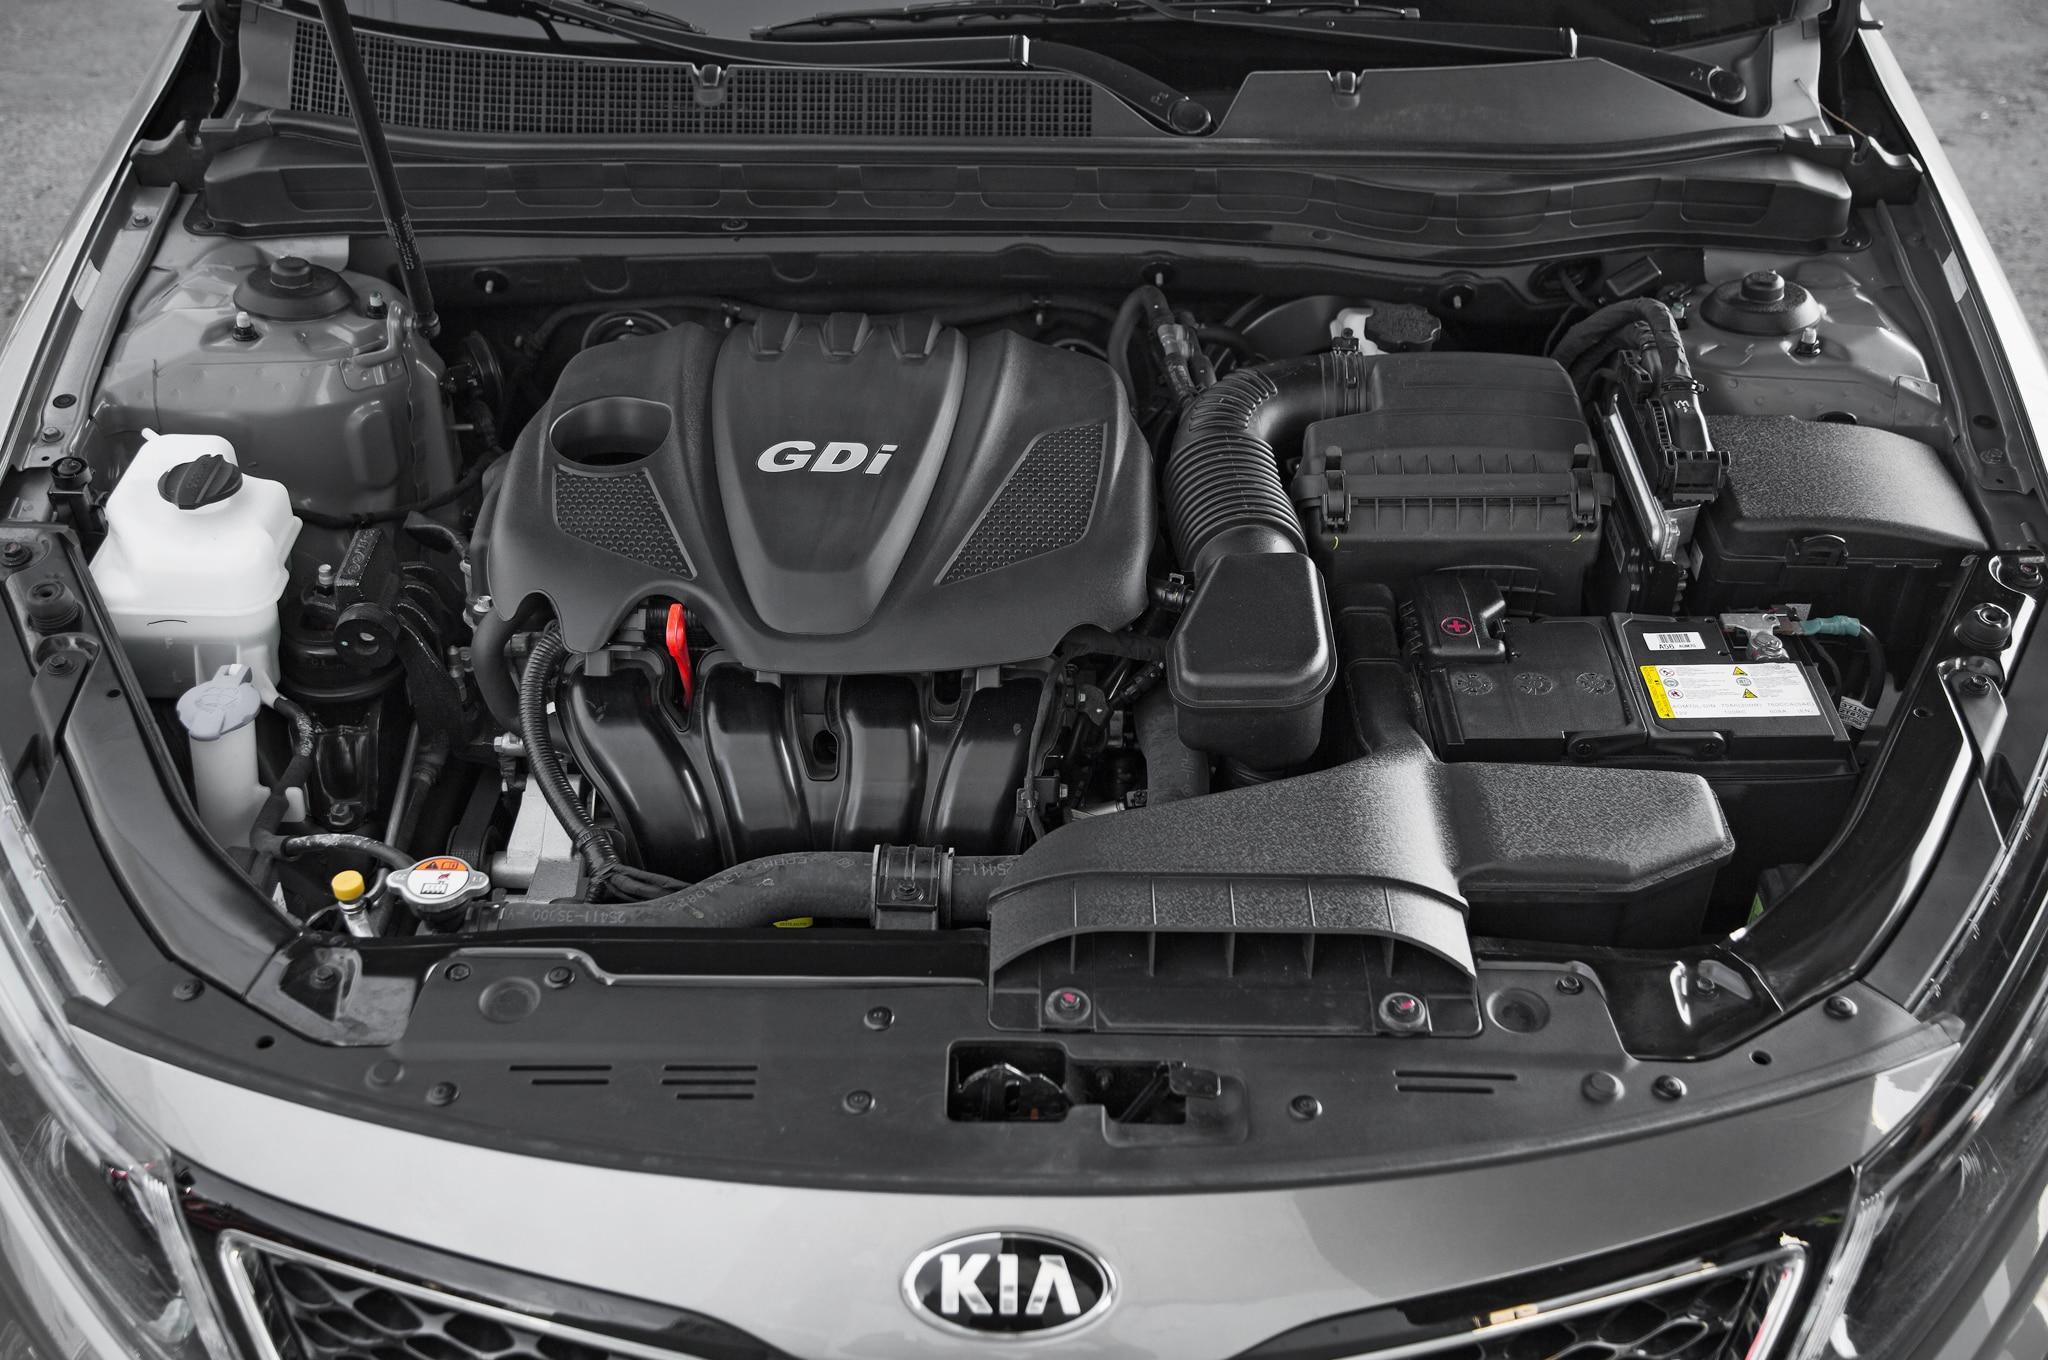 2014 Kia Optima EX. 48|142